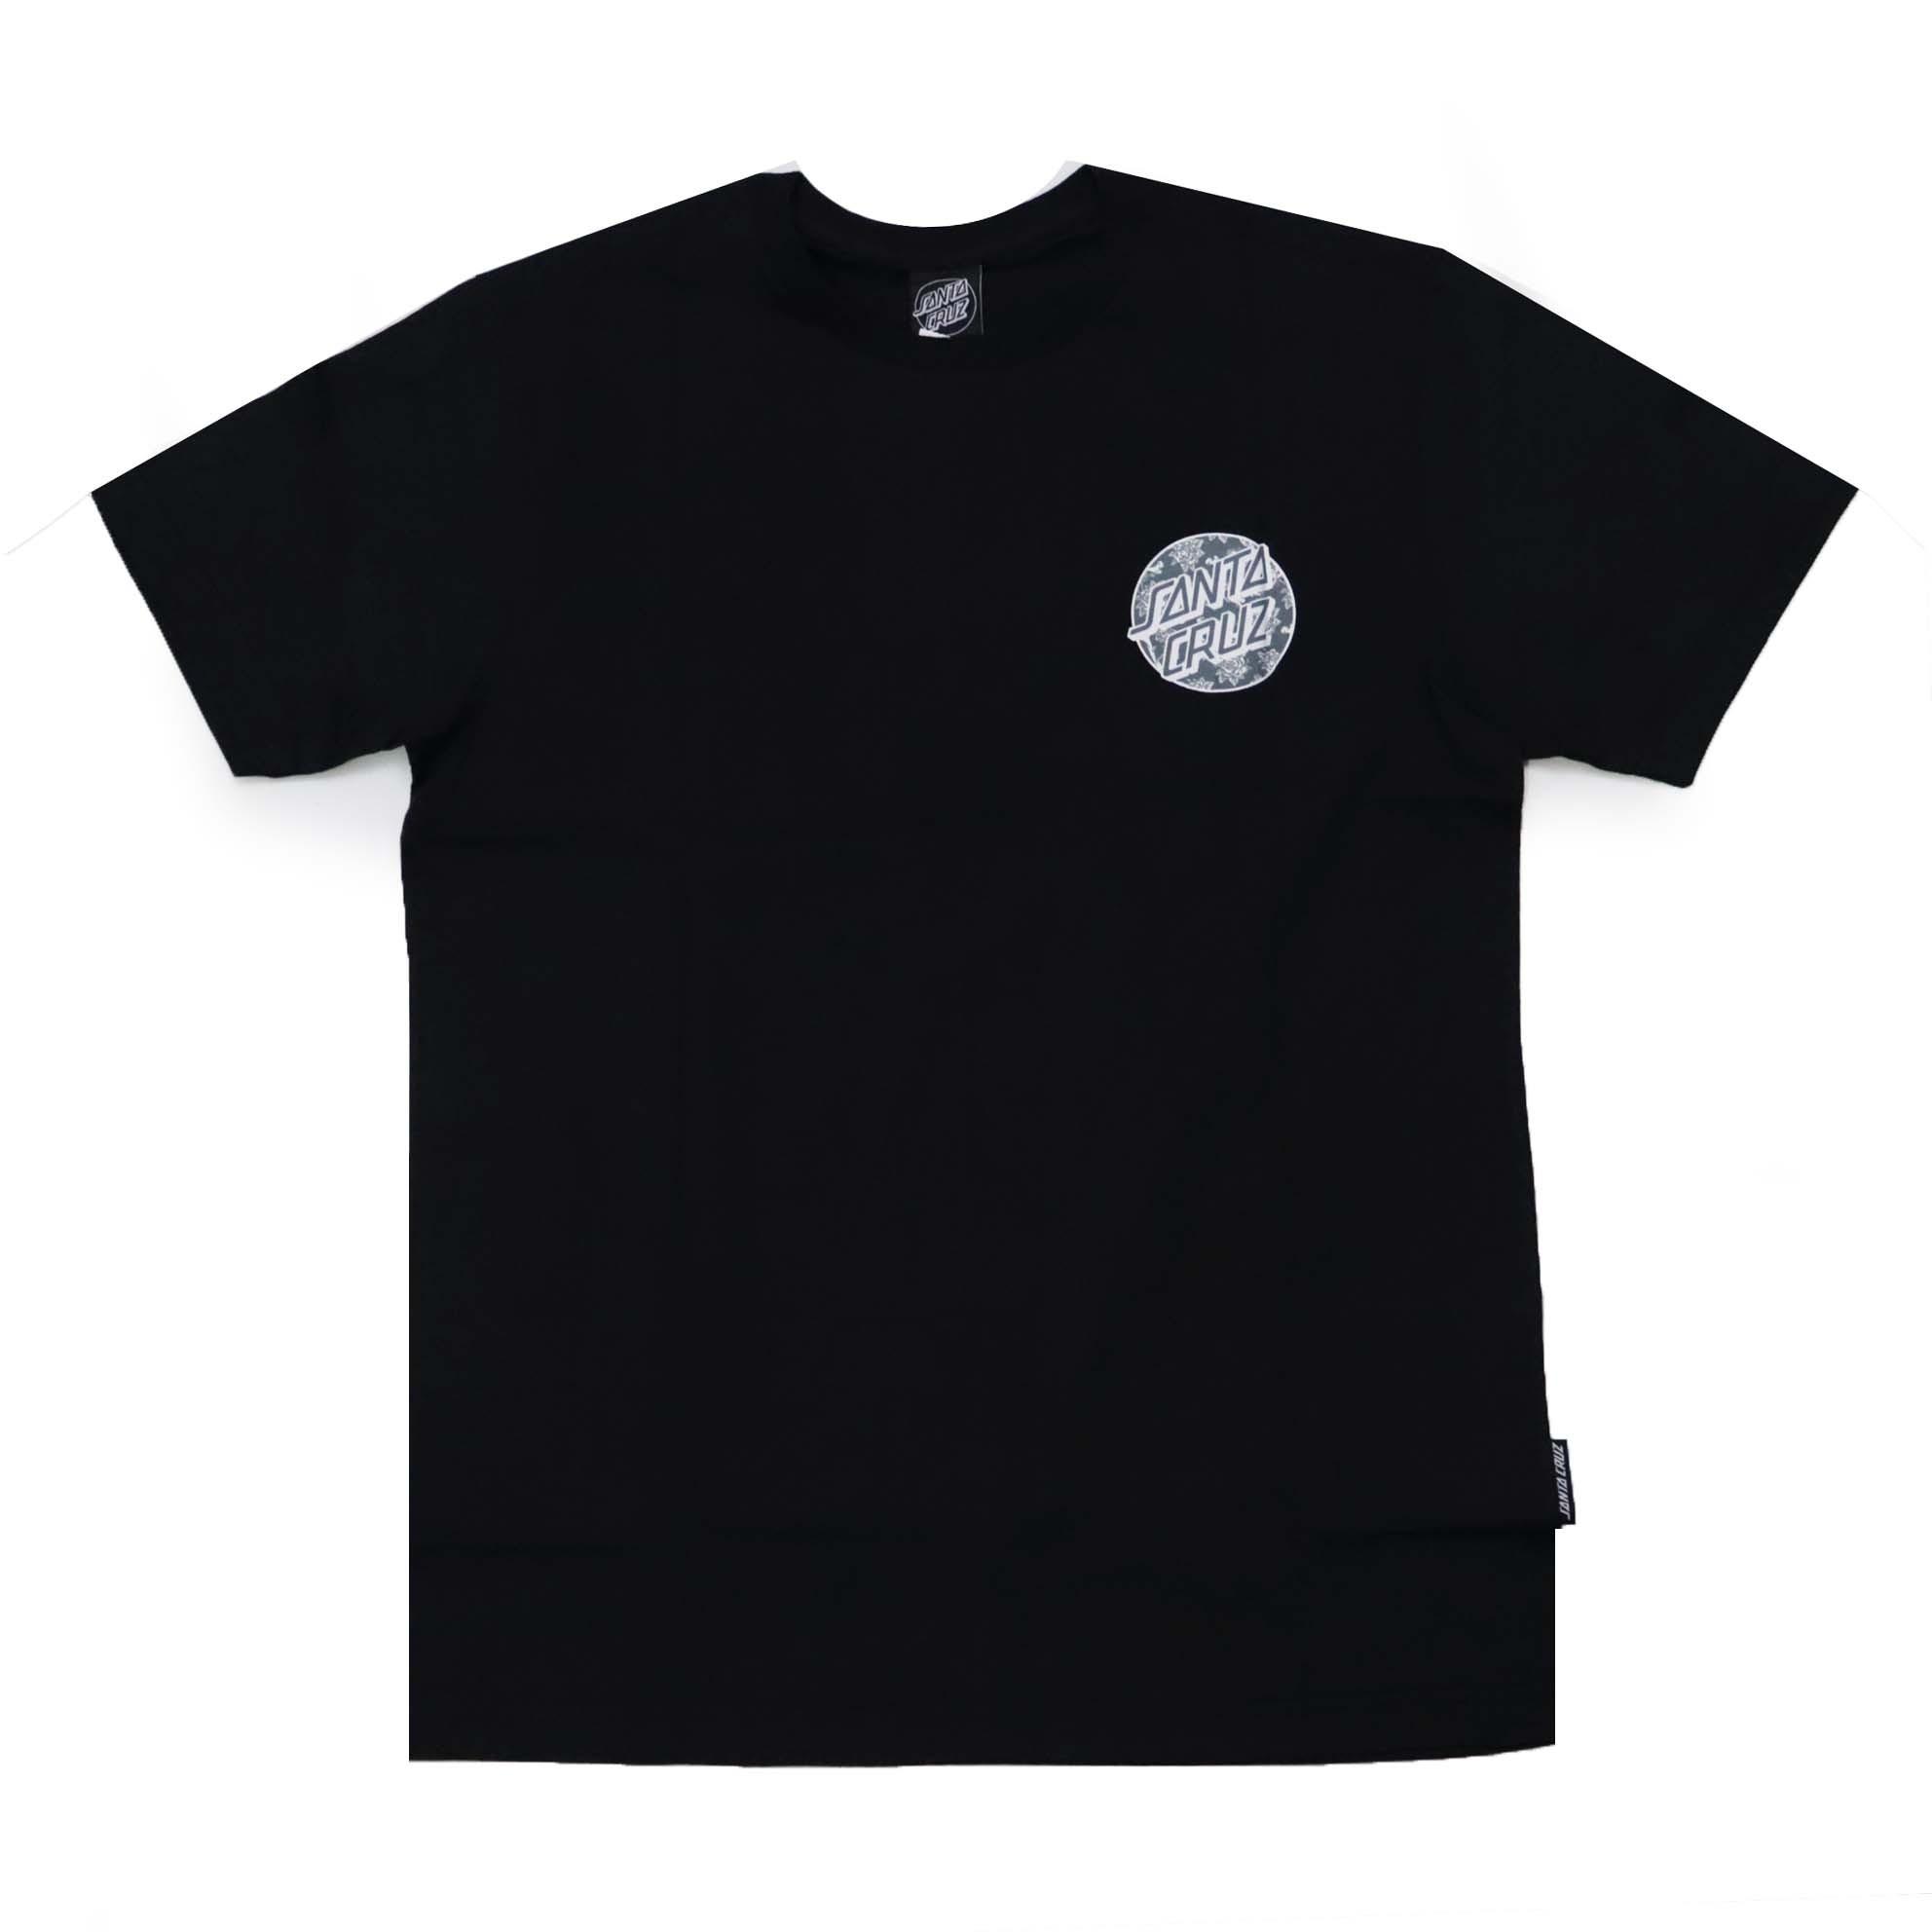 Camiseta Santa Cruz Floral Decay Dot - Preto